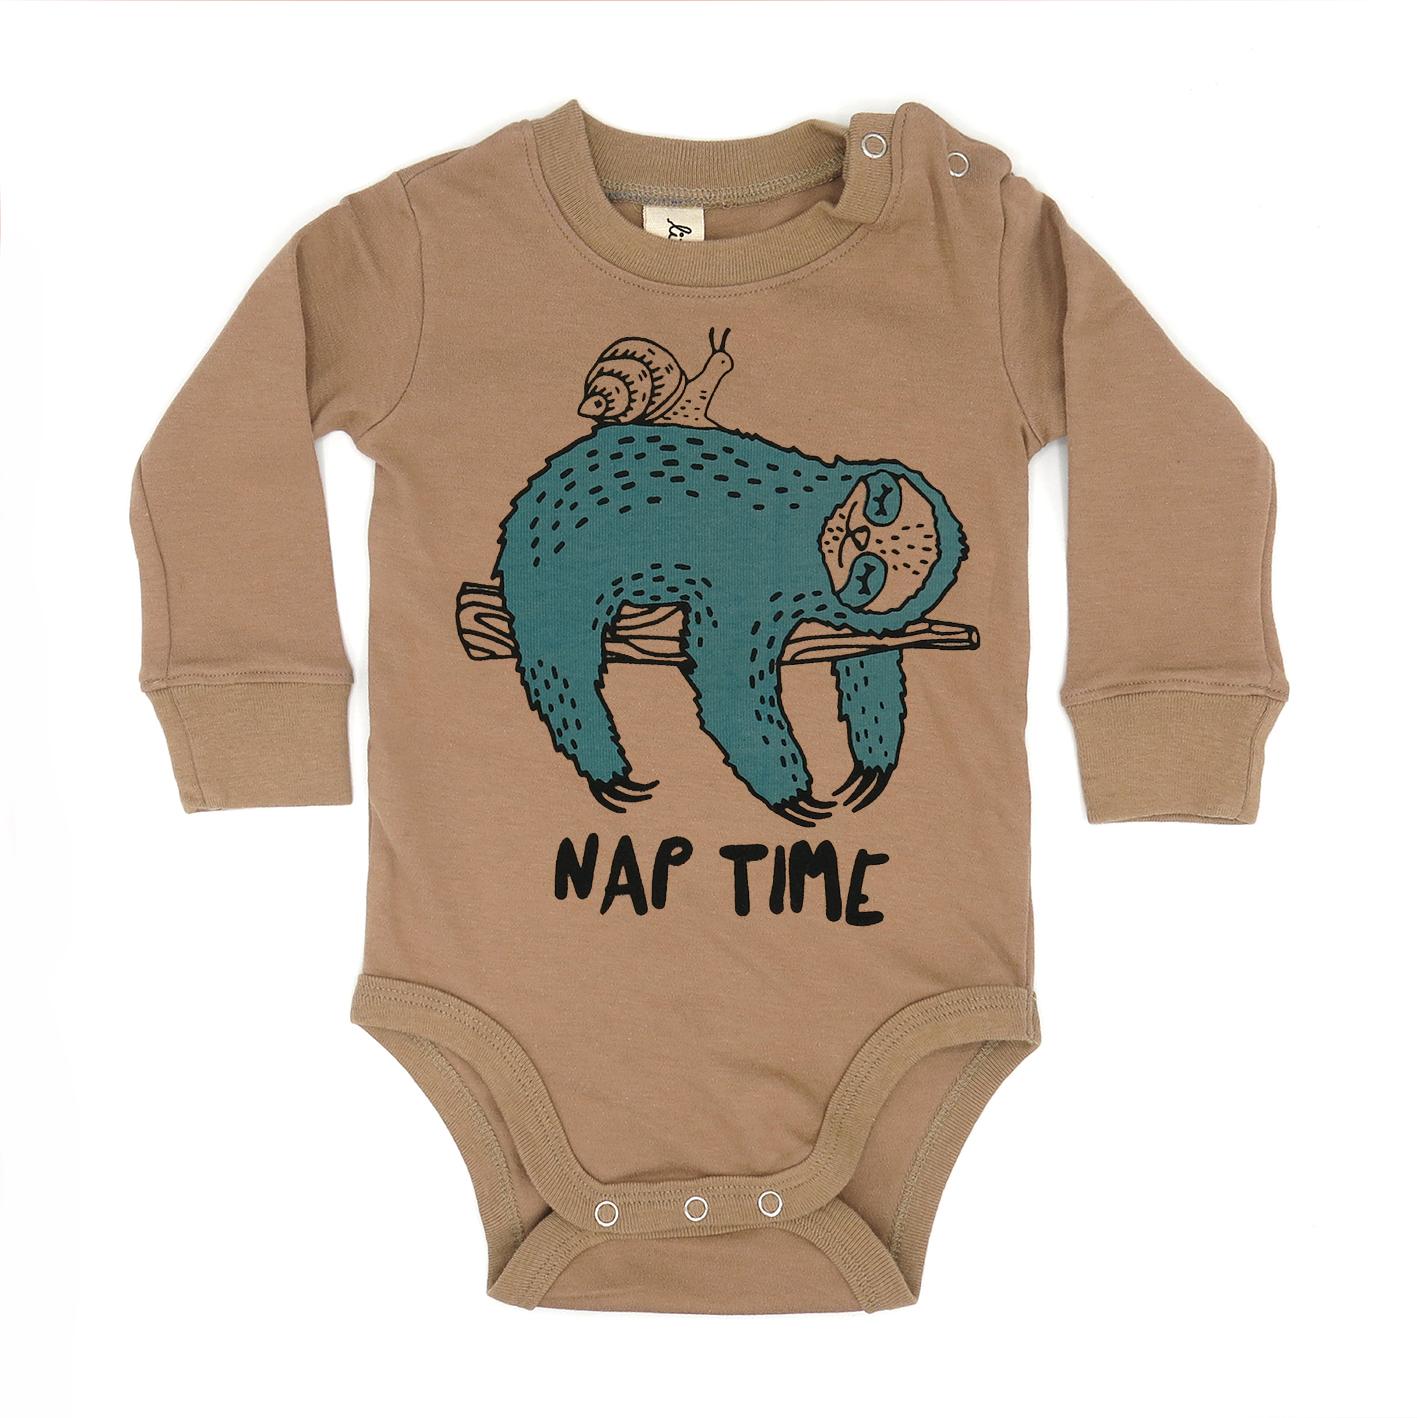 BABY 0-18M [C] LP0112 NAP TIME ONESIE